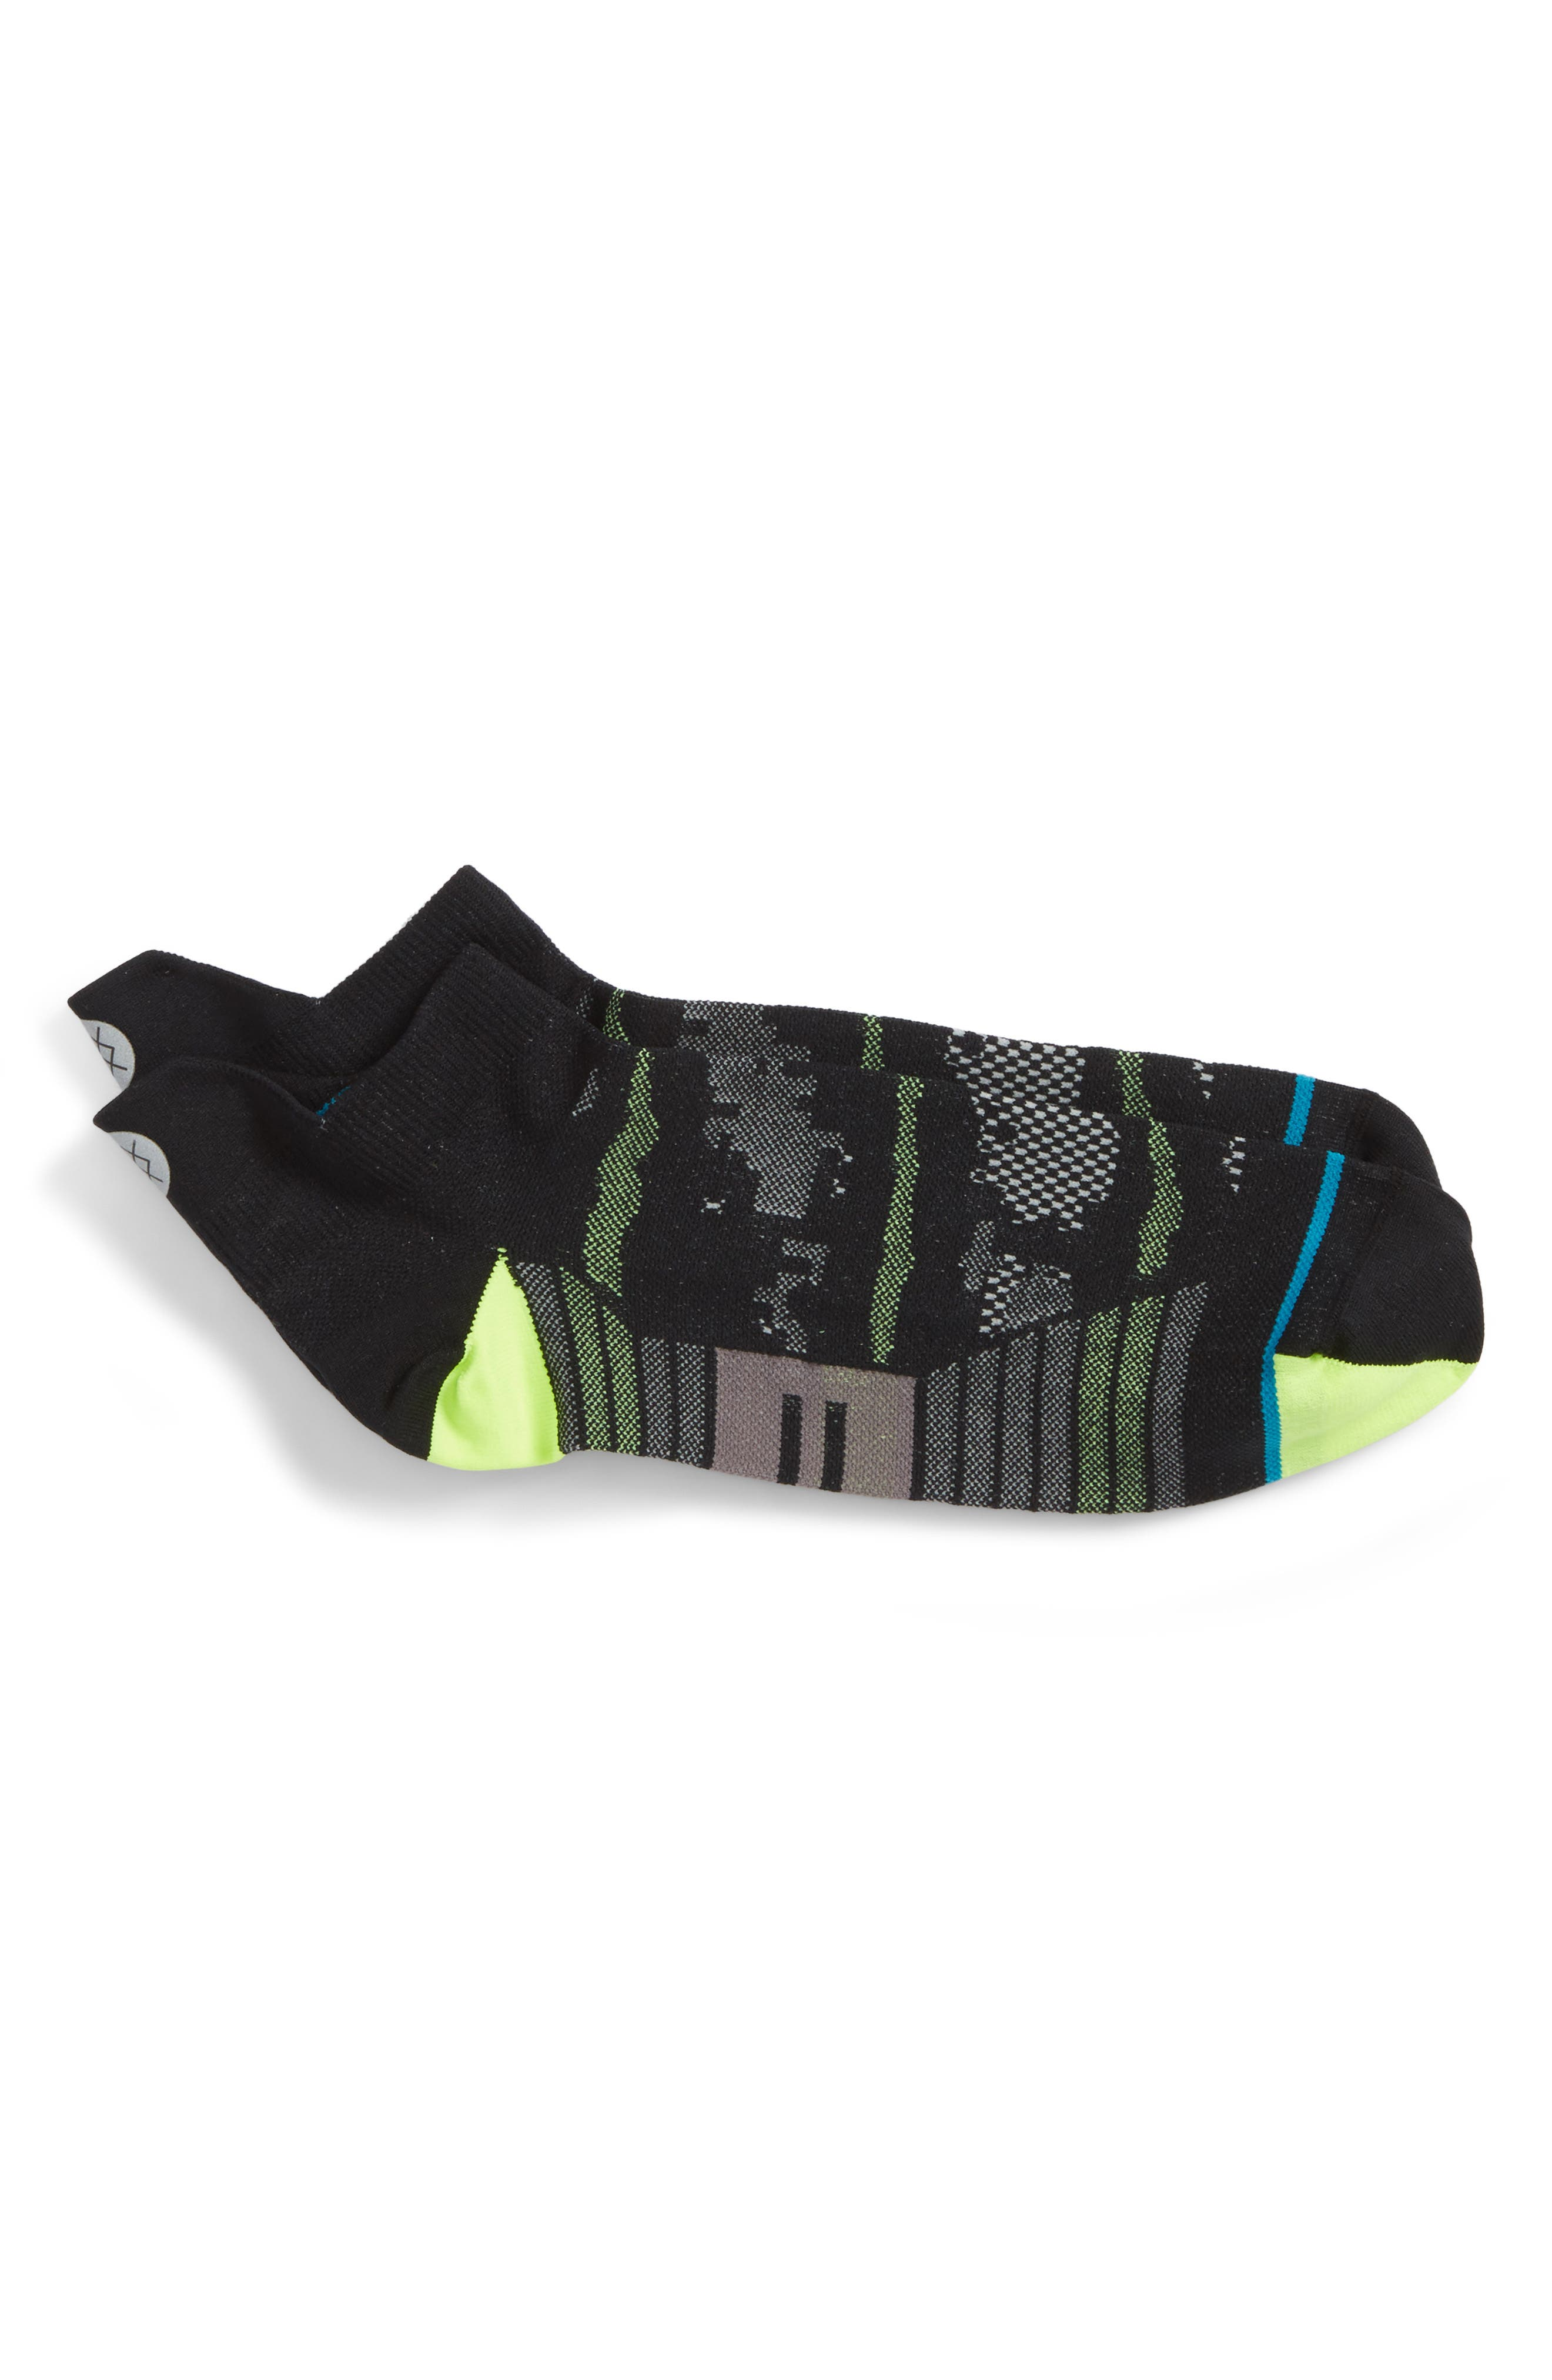 Stance Night Light Tab Socks